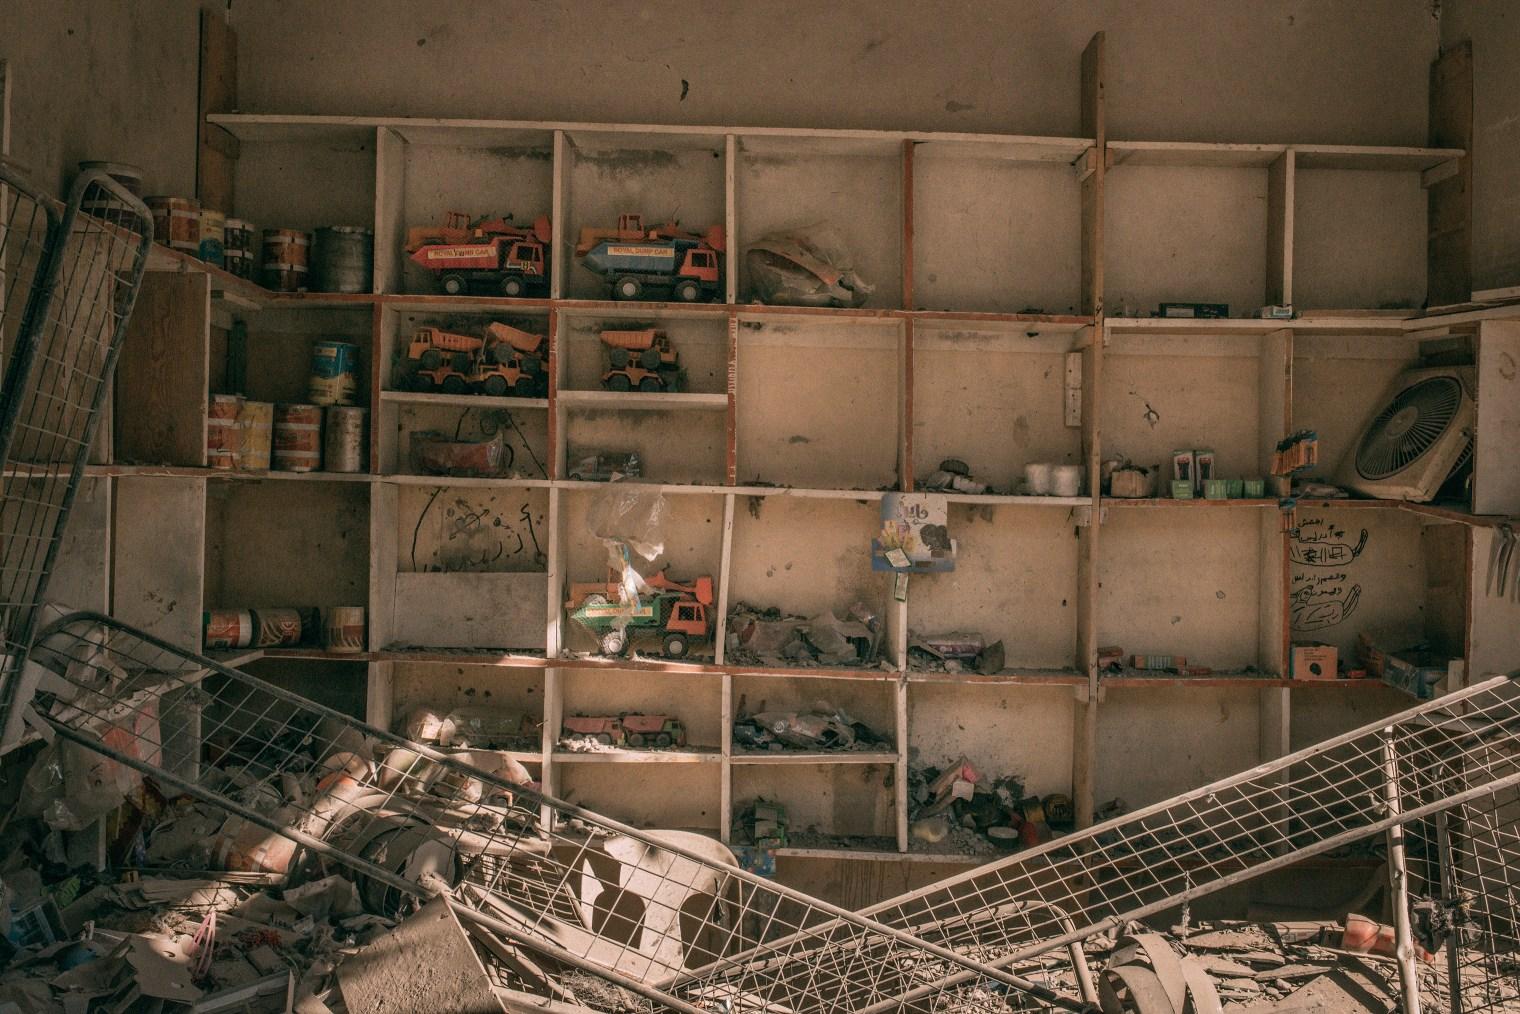 emanuele-satolli-raqqa-syria-reconstruction-chemistry-trucks